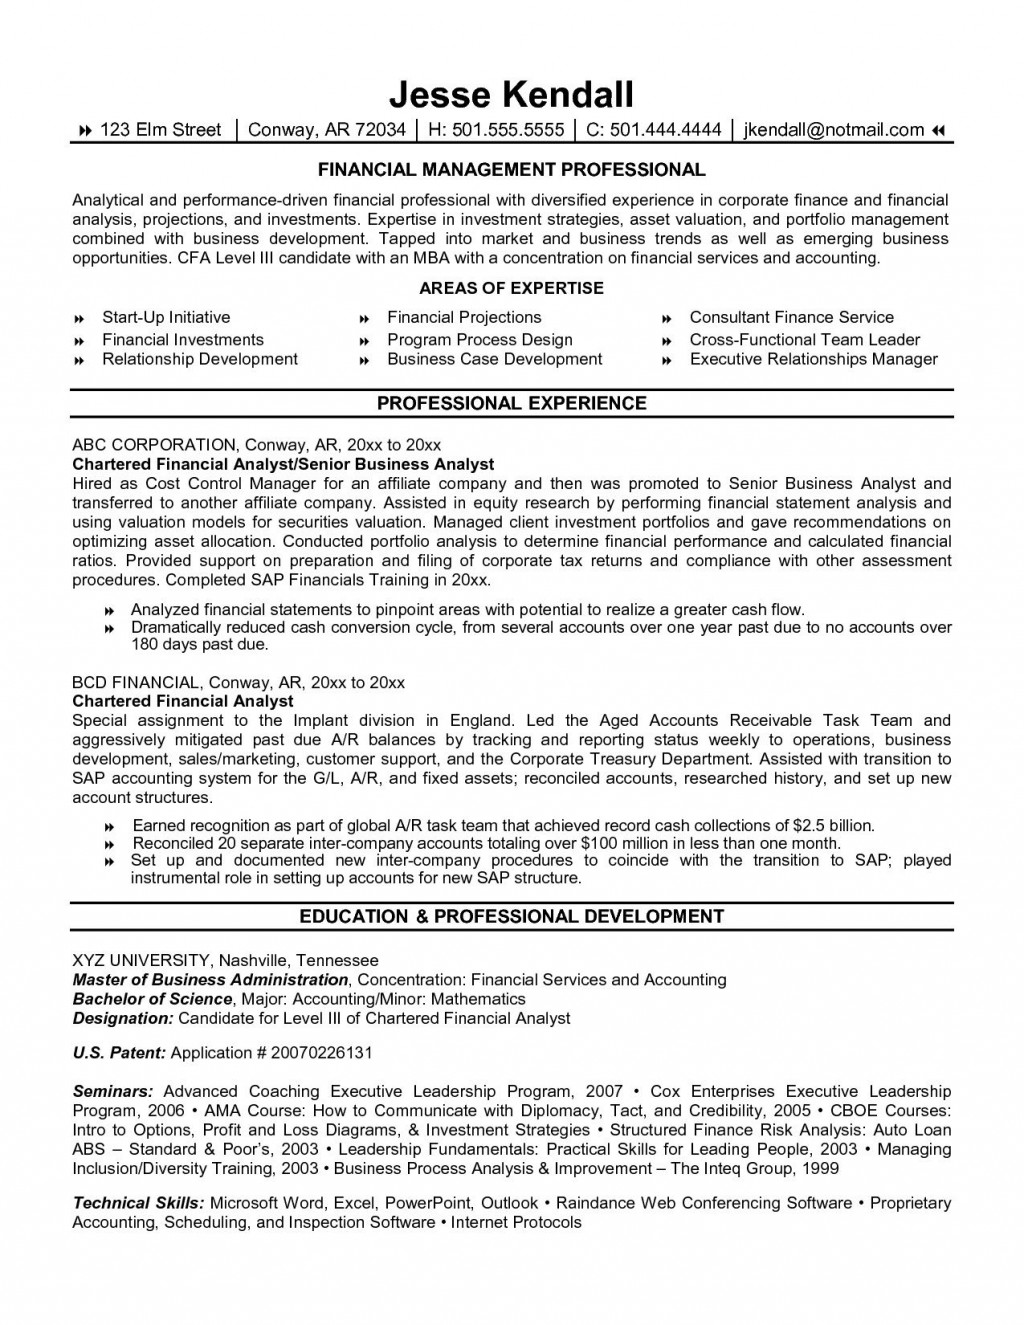 002 Frightening Finance Resume Template Word High Def  Financial Analyst DownloadLarge